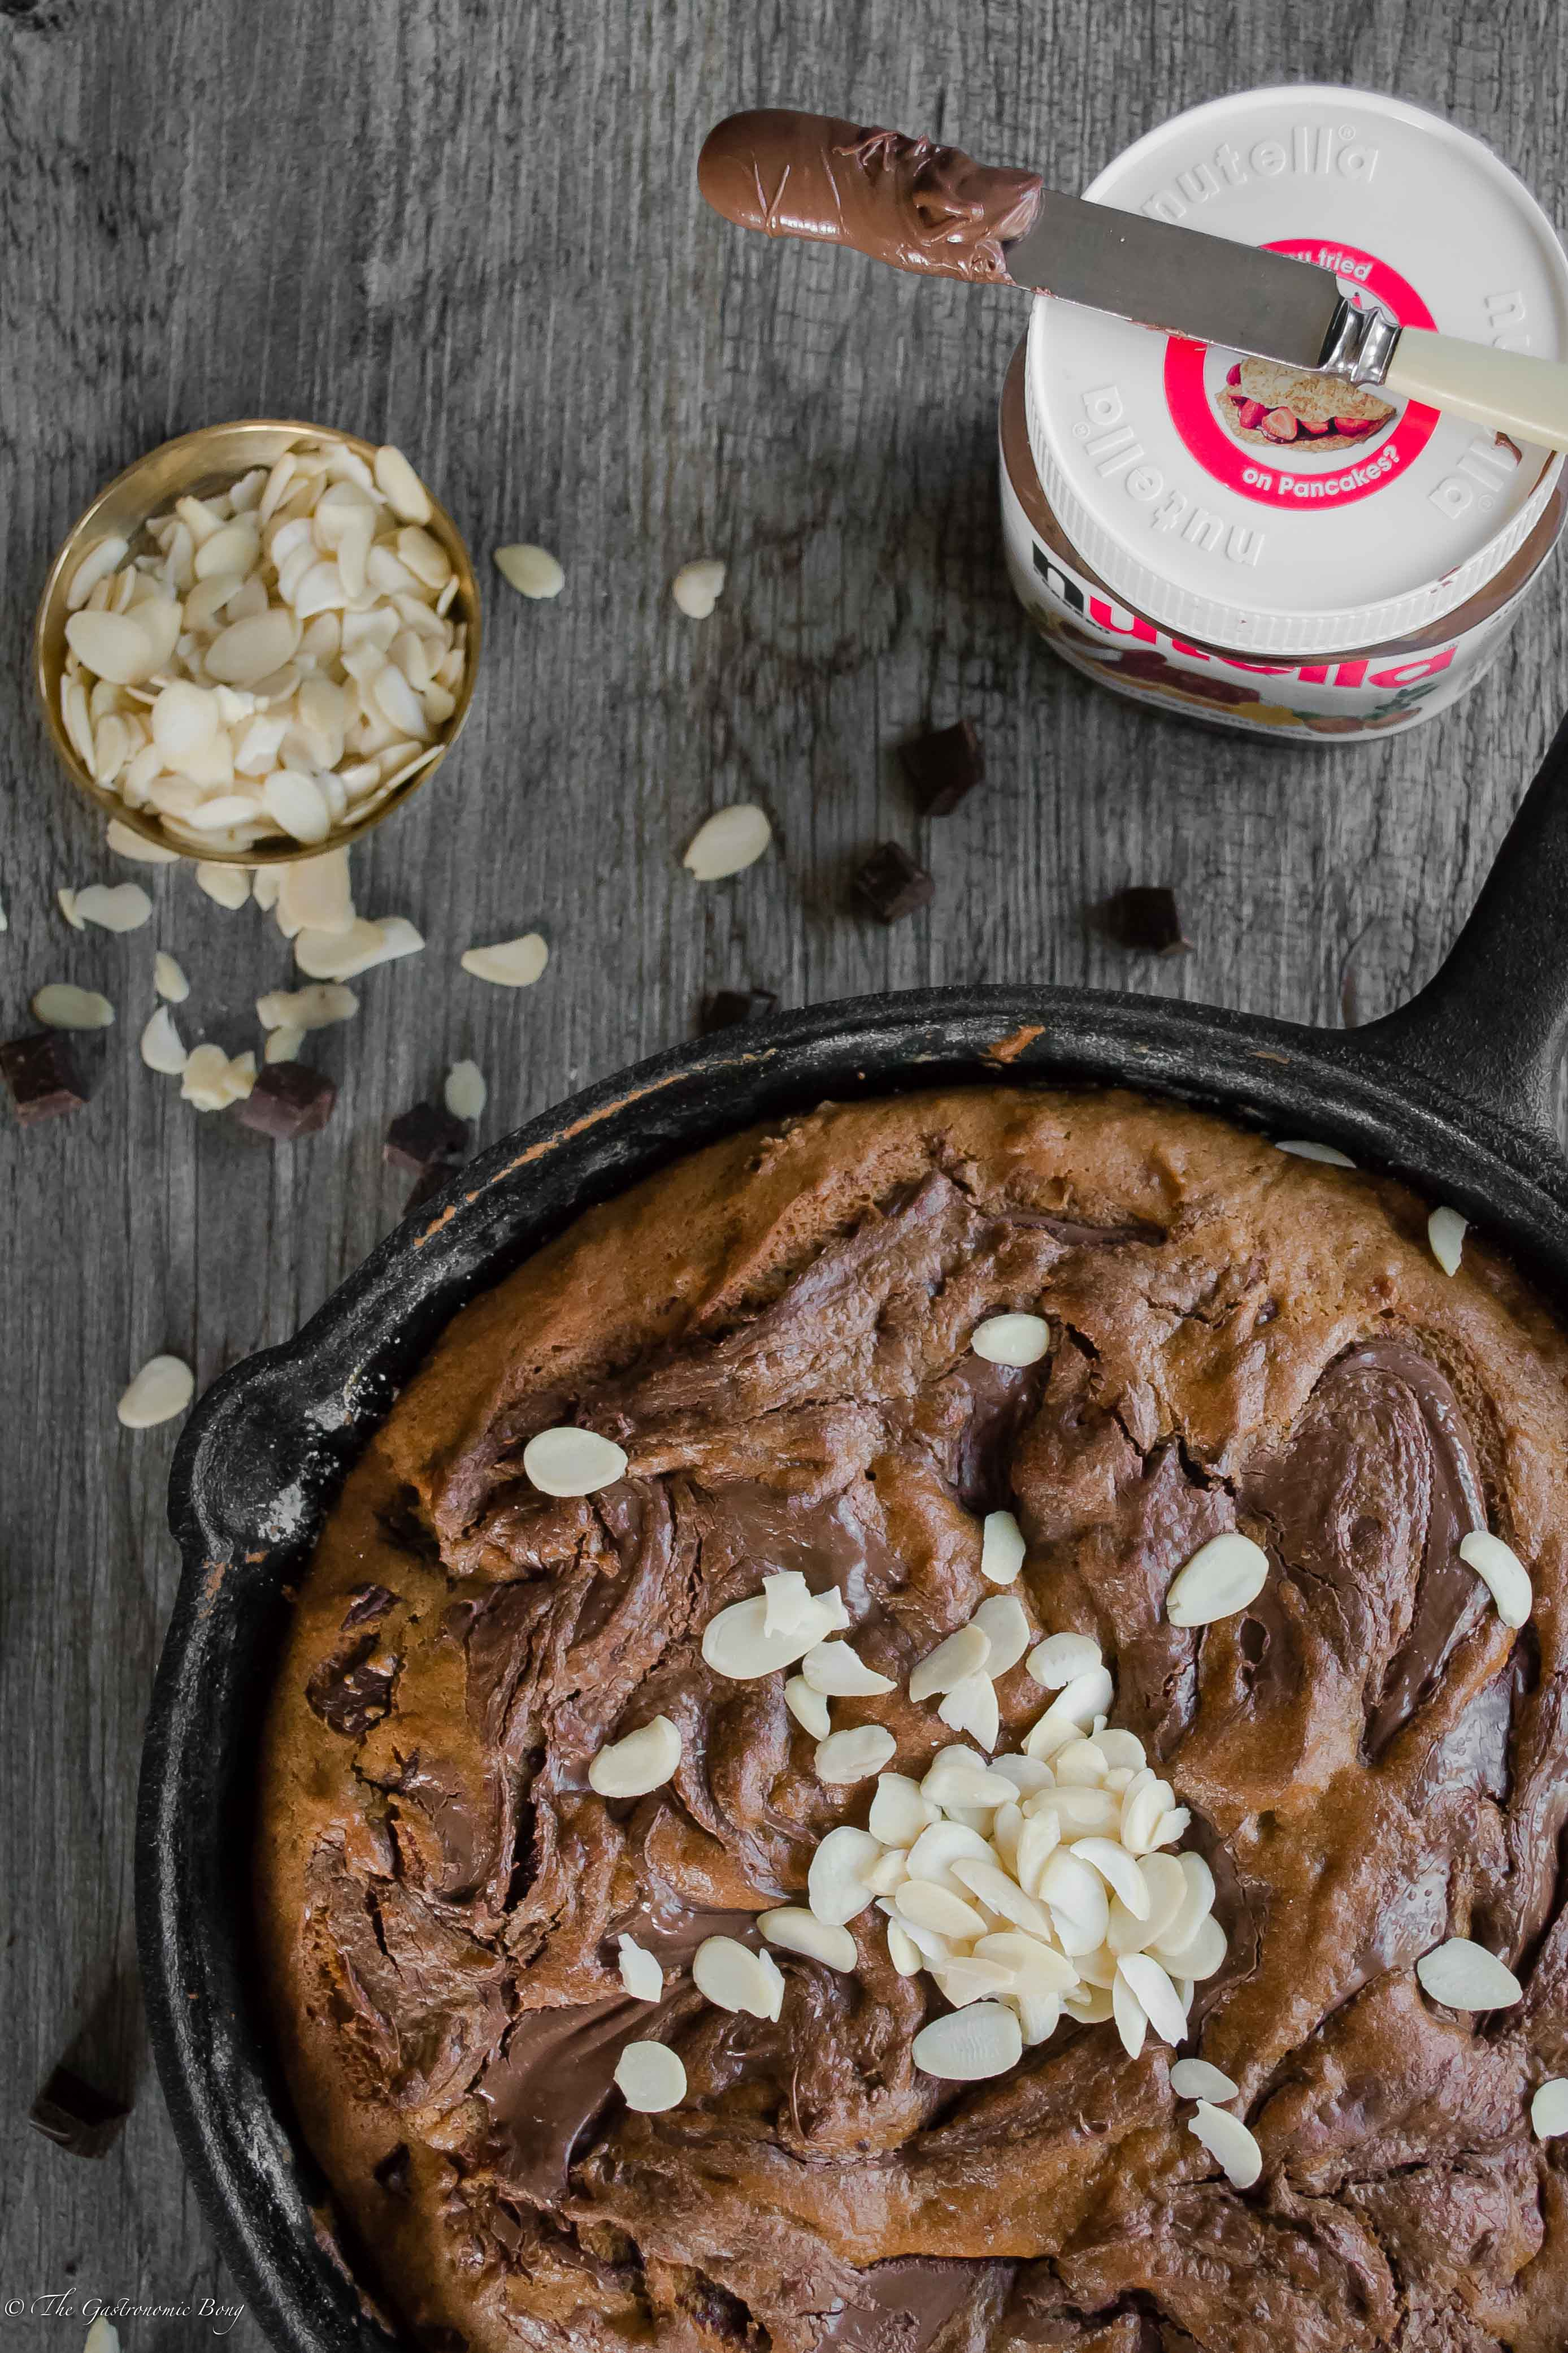 Nutella Swirled {Chocolate Chunk} Peanut Butter Banana Skillet Cake